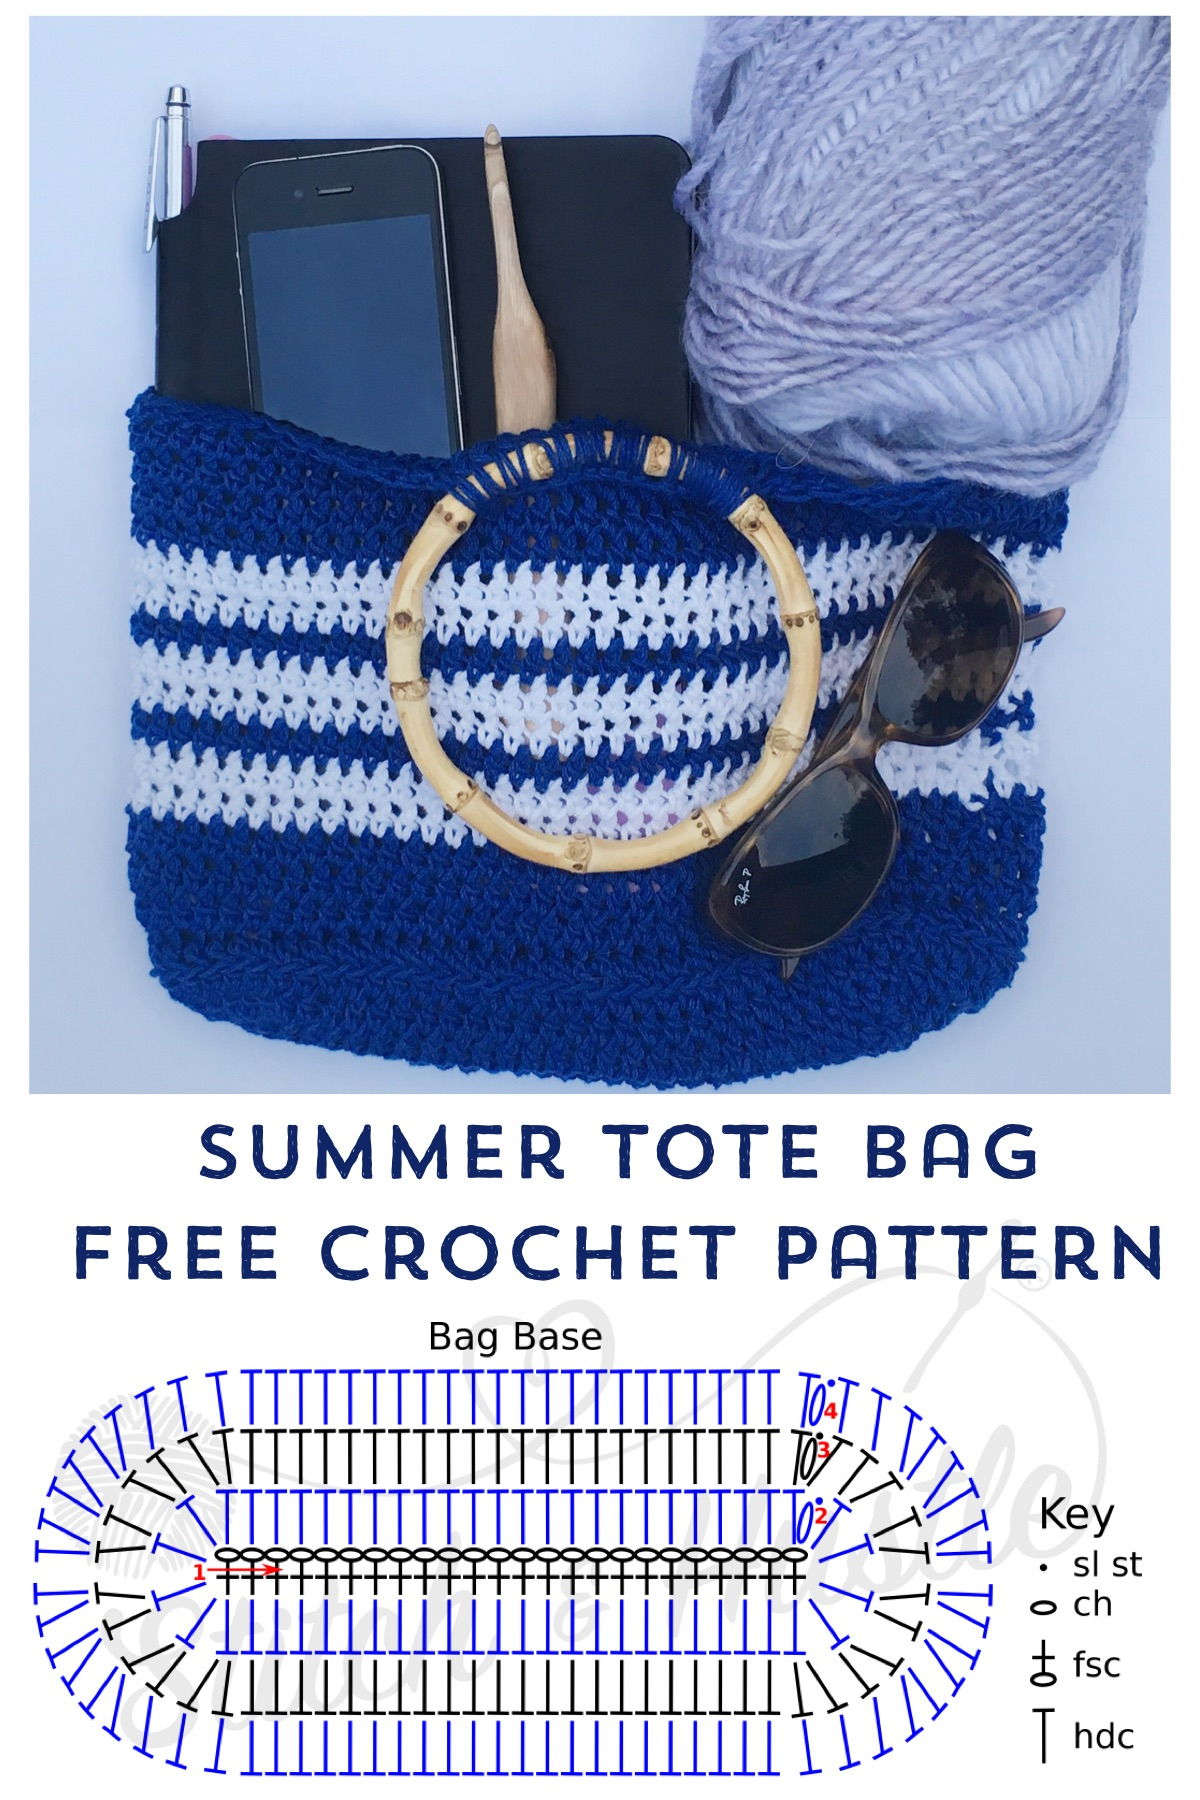 summer-tote-bag-free-crochet-pattern-2.jpg